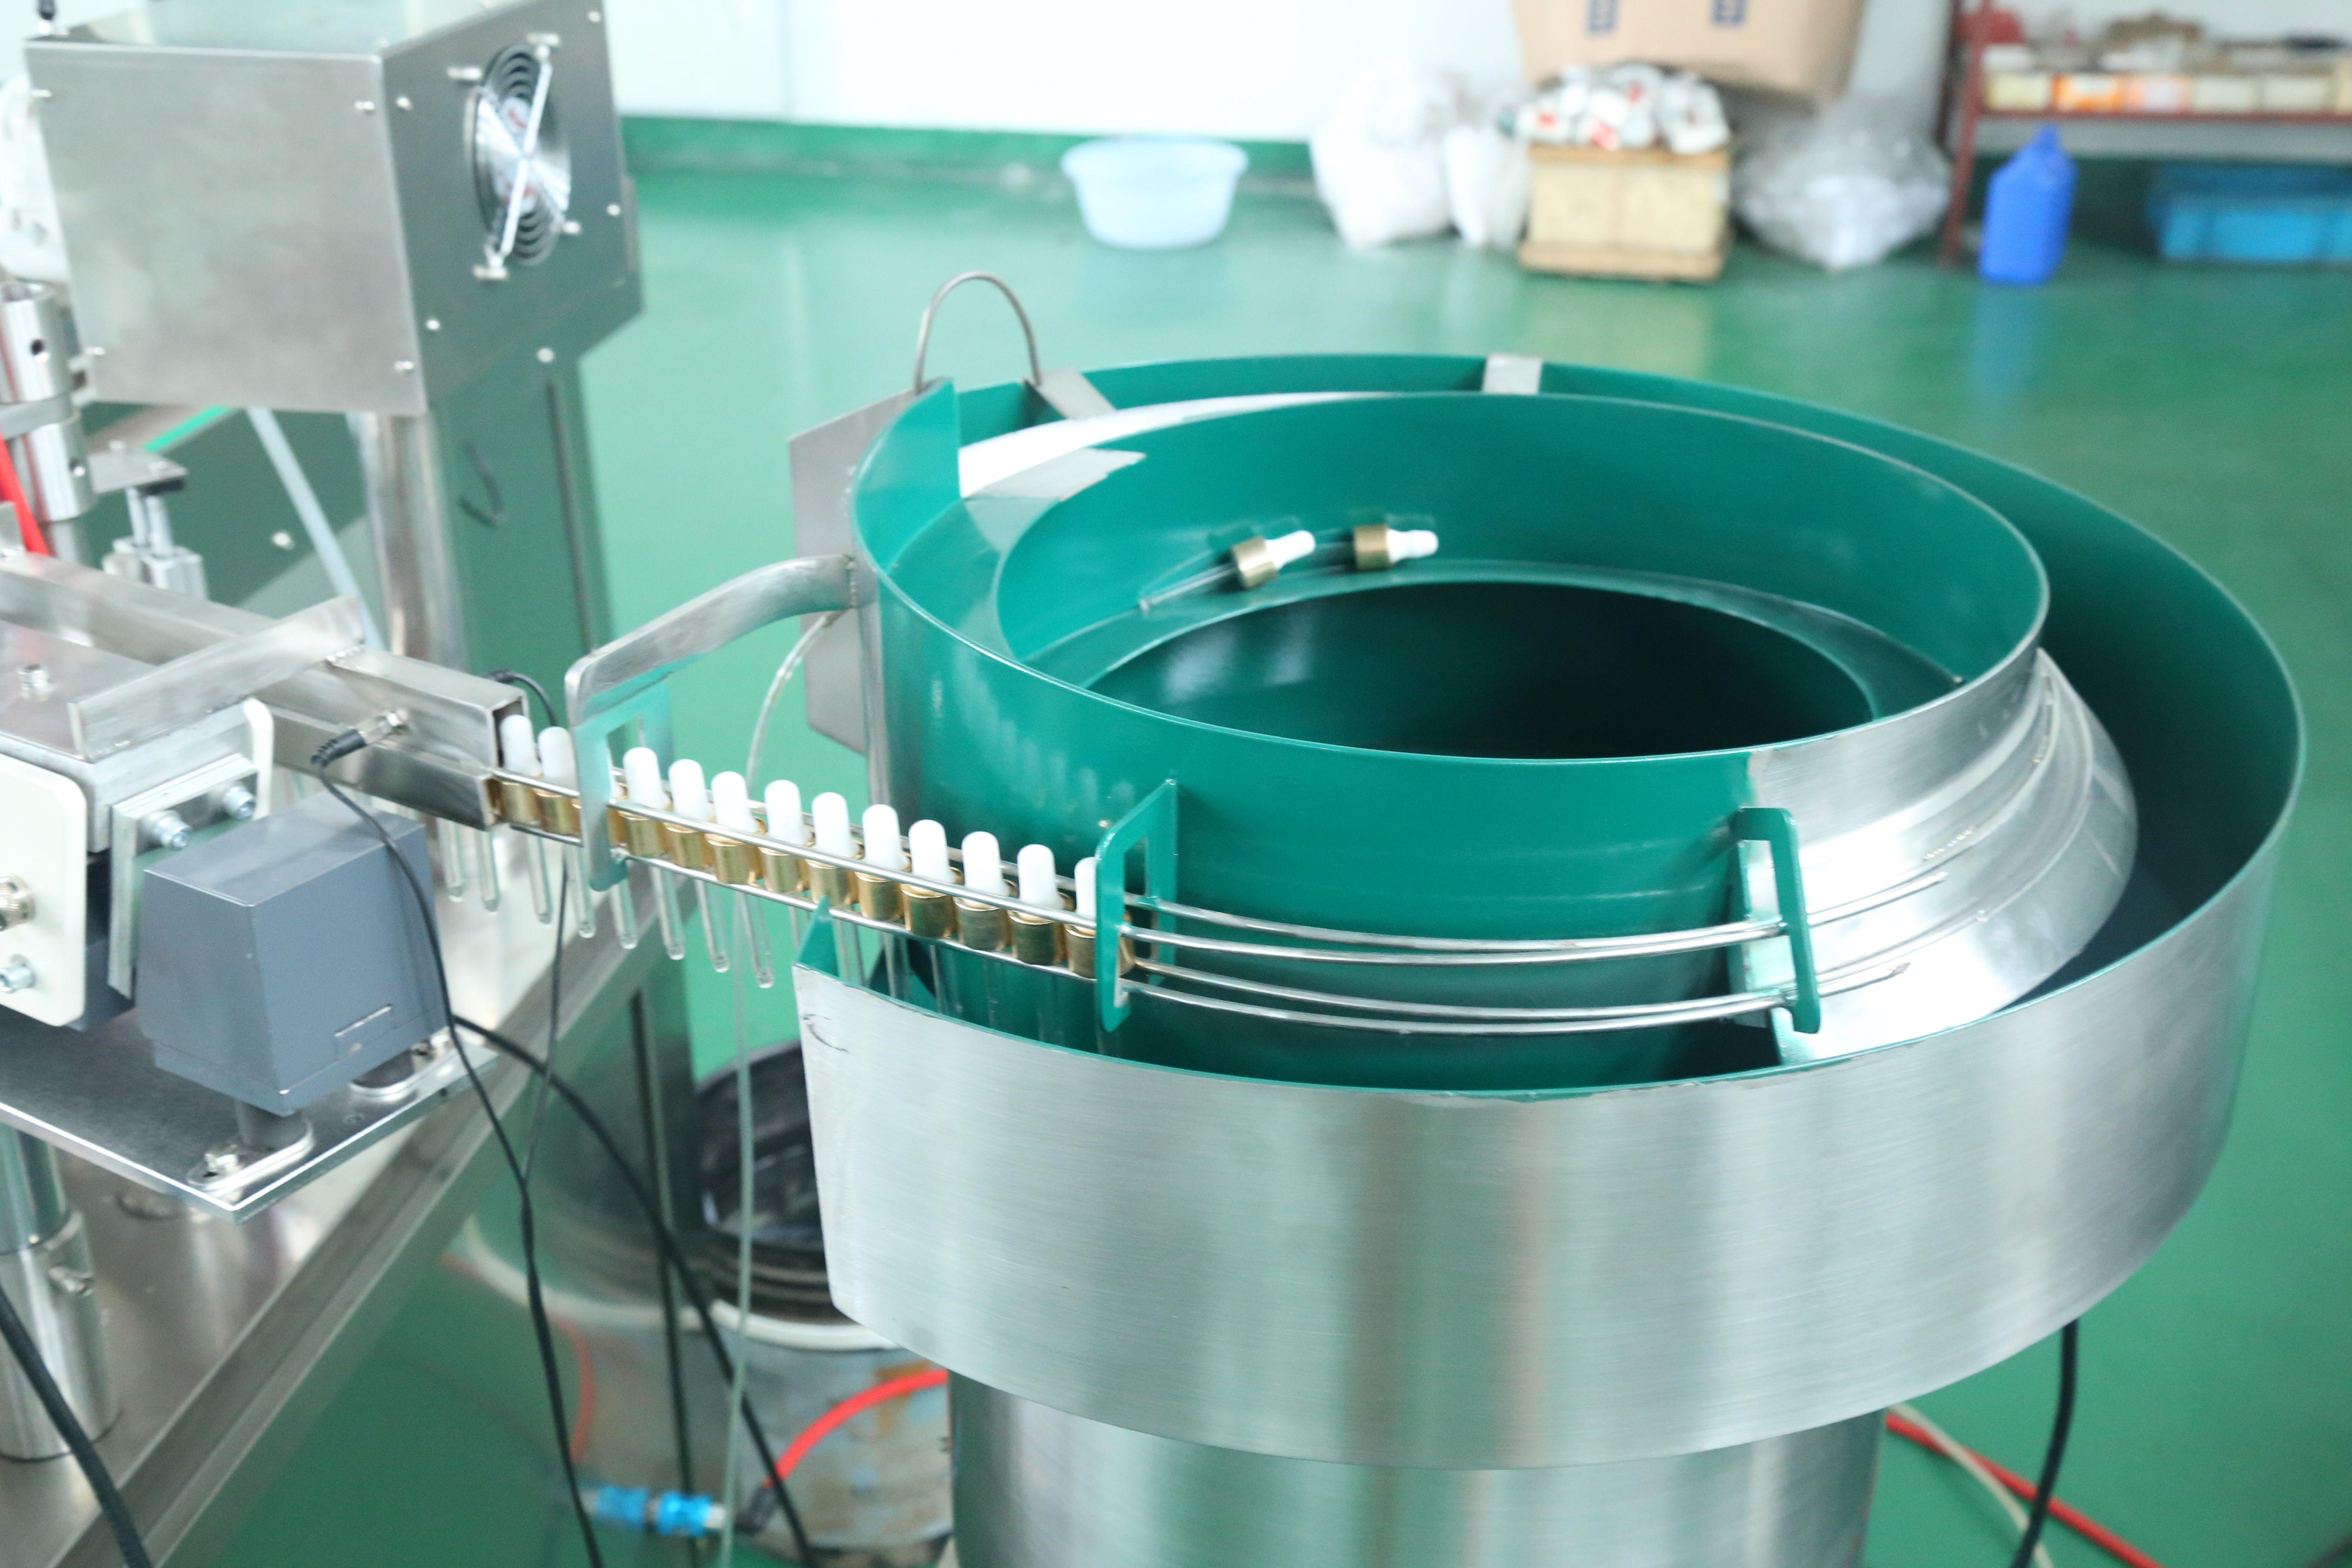 Automatic Skin Serum Filling Machine 10ml 30ml Smallliquidpackagingmachine Fillingmachineliquid Liquidsoupfillin Wine Drinks Small Bottles Liquid Oil